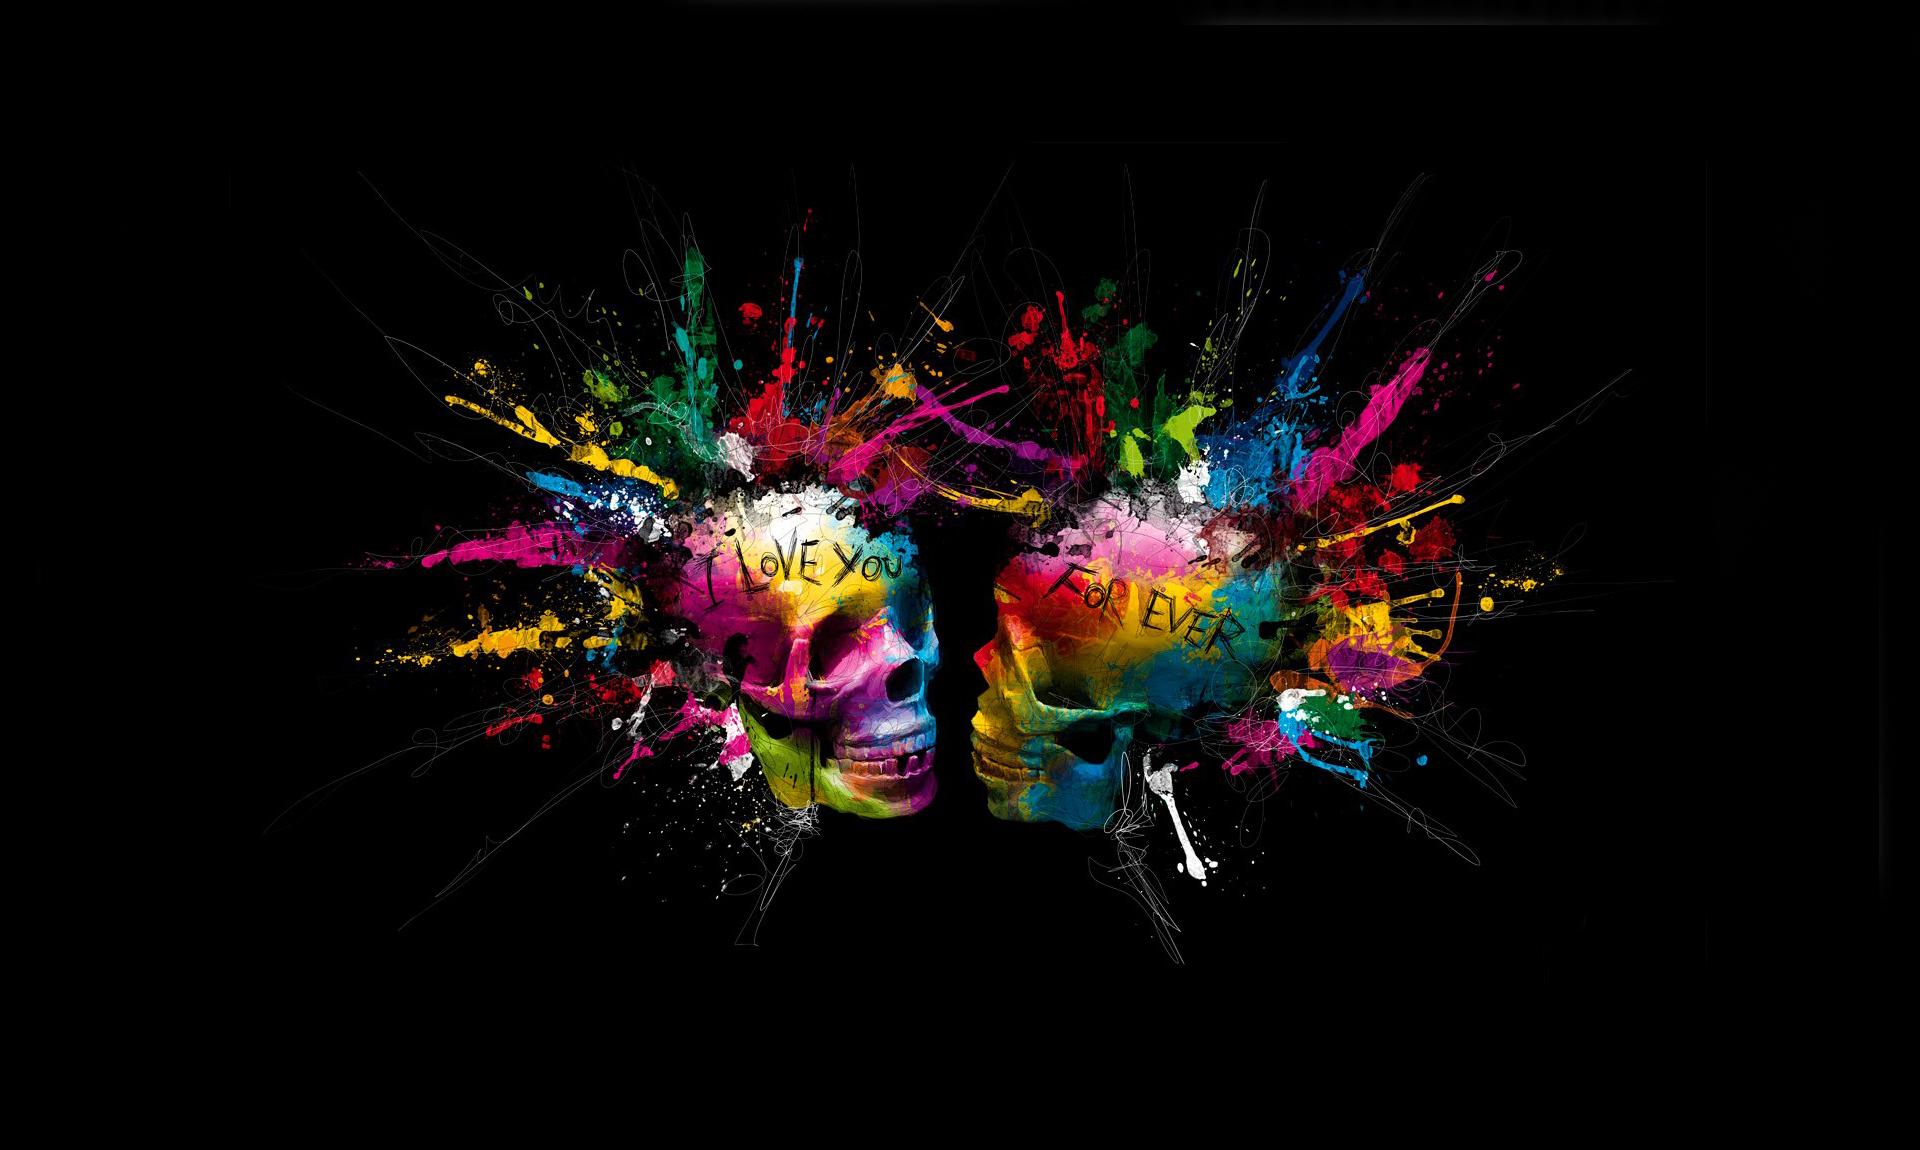 Colorful Skull Iphone Wallpaper Dark Skull Love Dark Colors Colorful Artistic Art Wallpaper